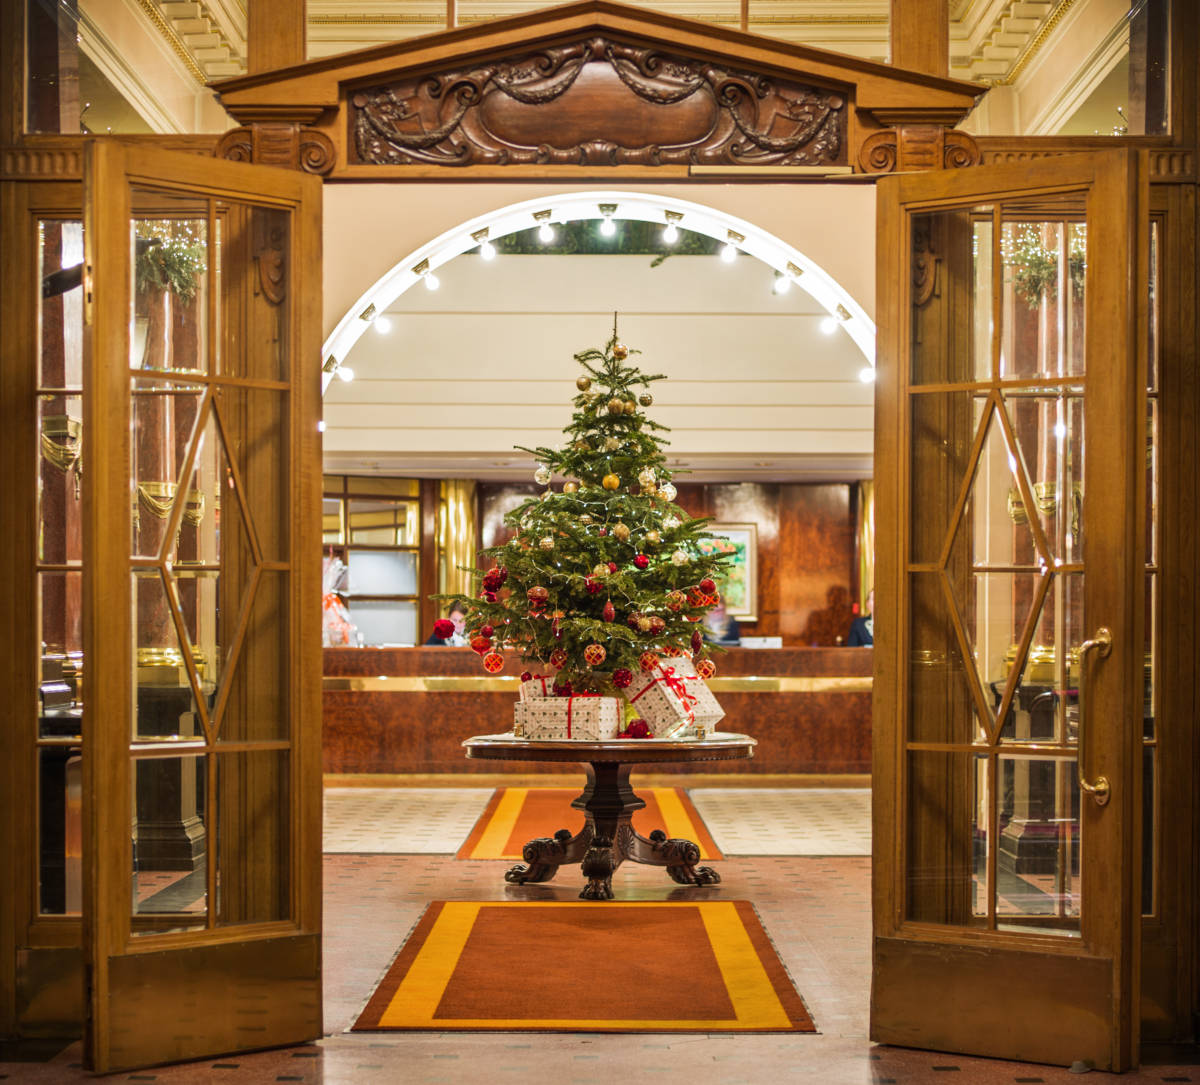 A0002170 3 2 - Grand Hotel Europe. К Новому году готов